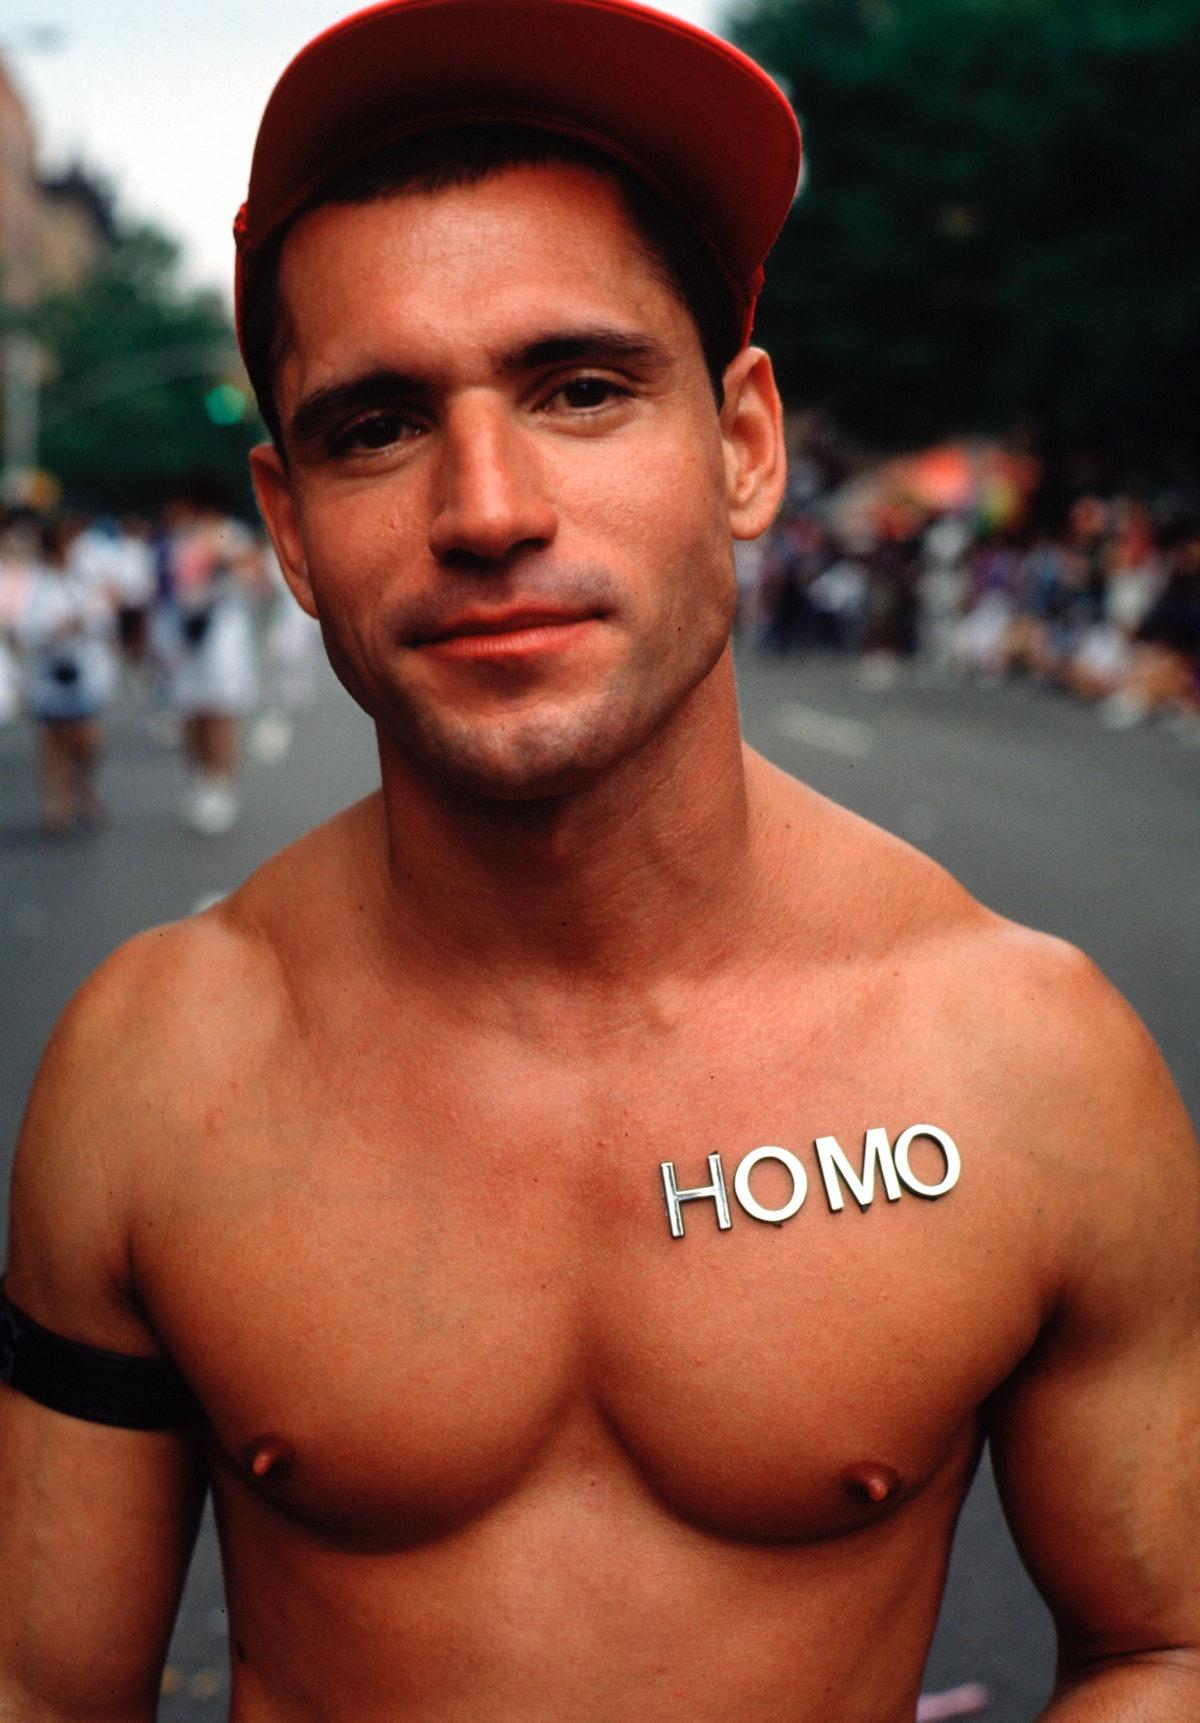 Gay man displays his homosexuality